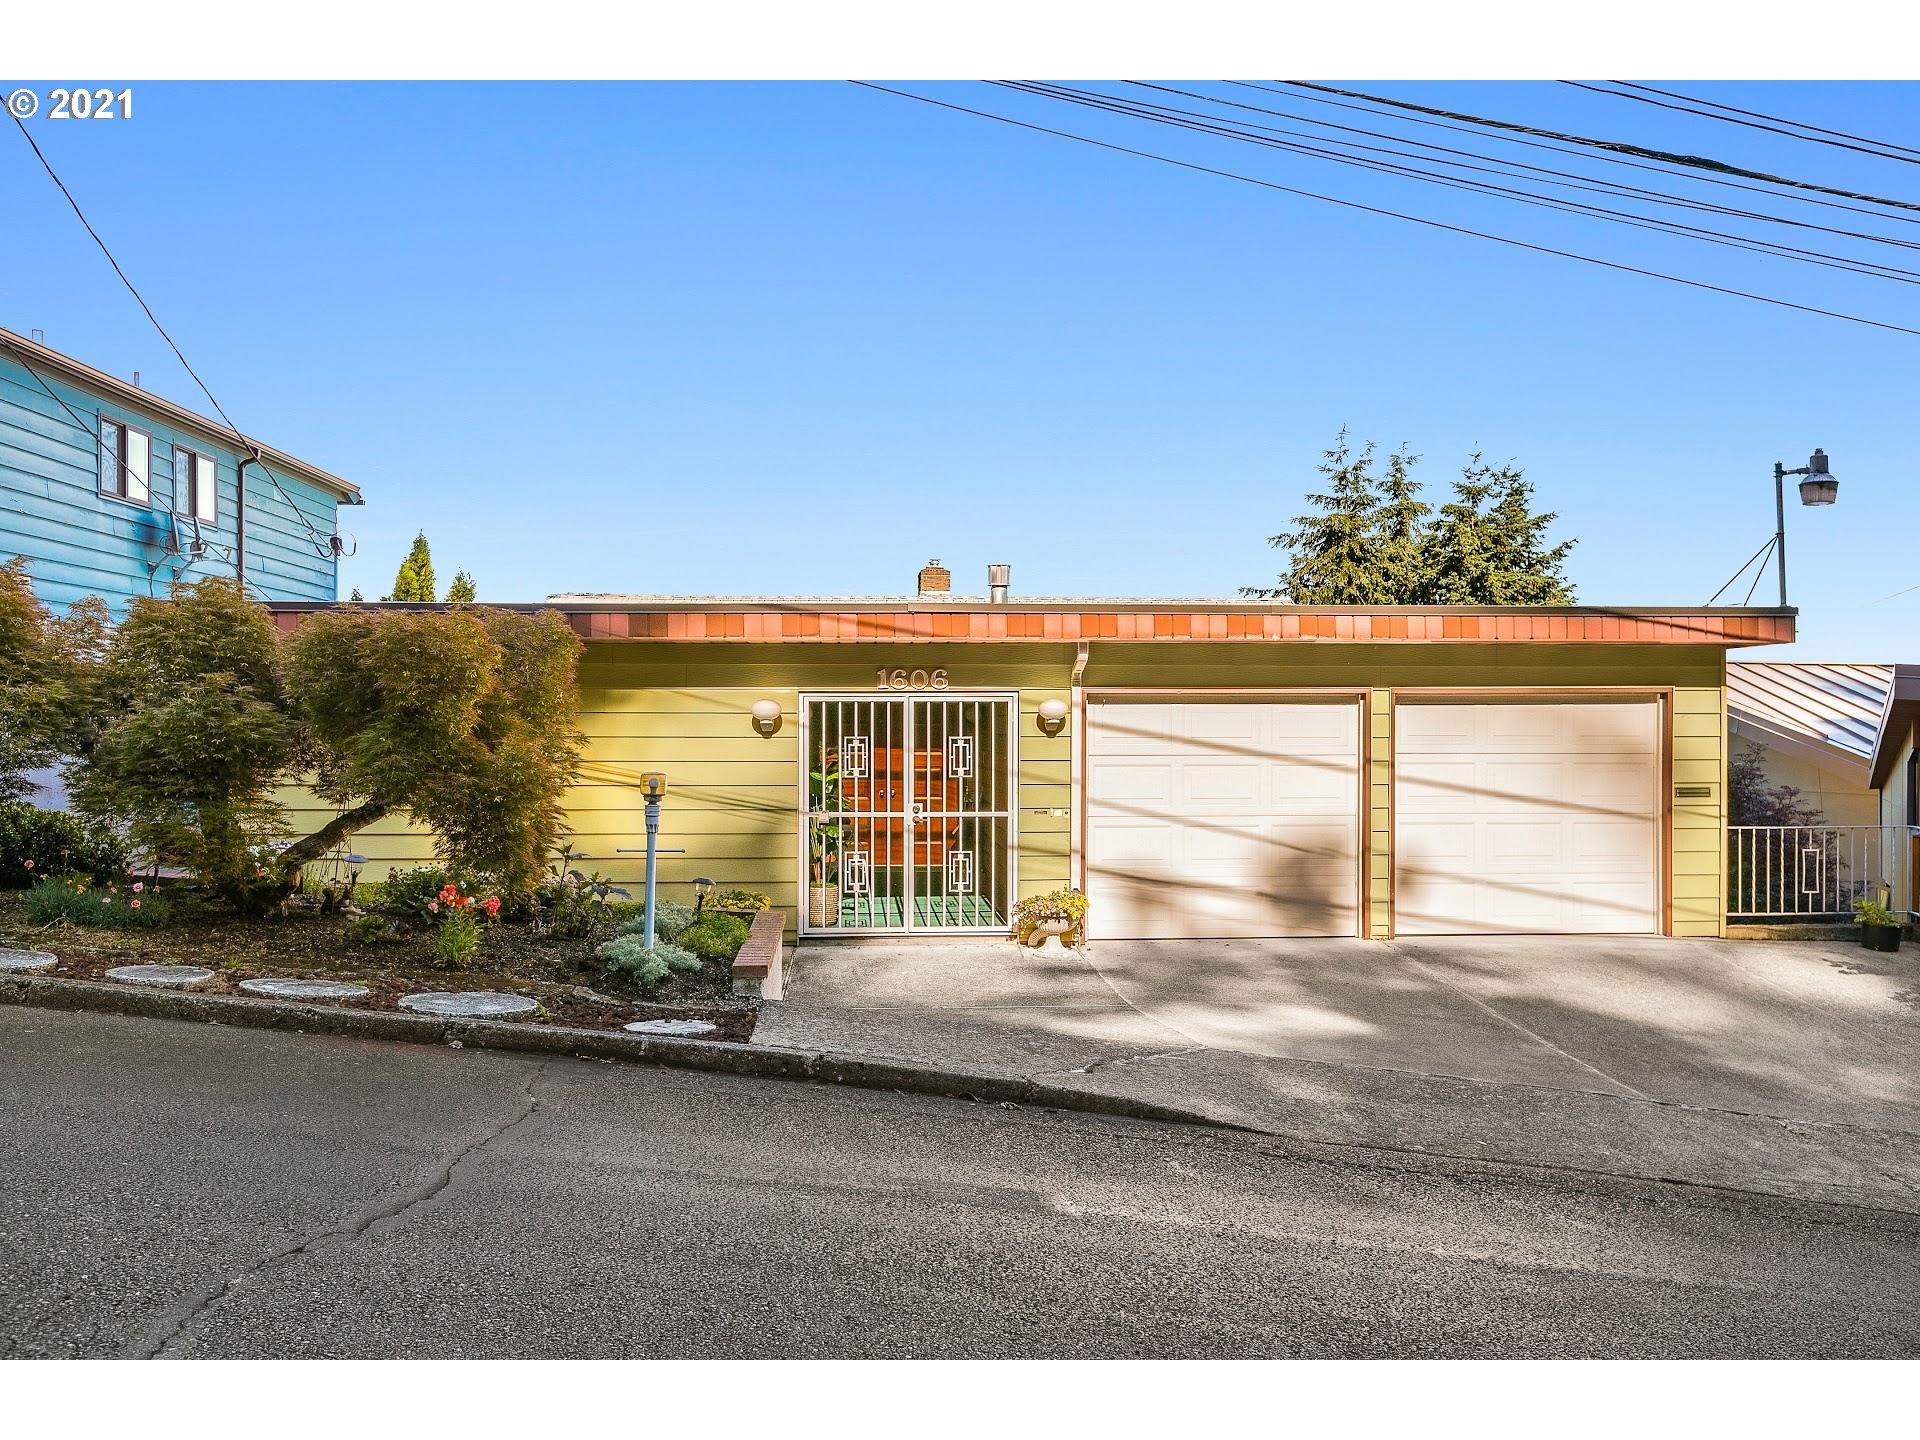 1606 SE 71ST AVE, Portland OR 97215